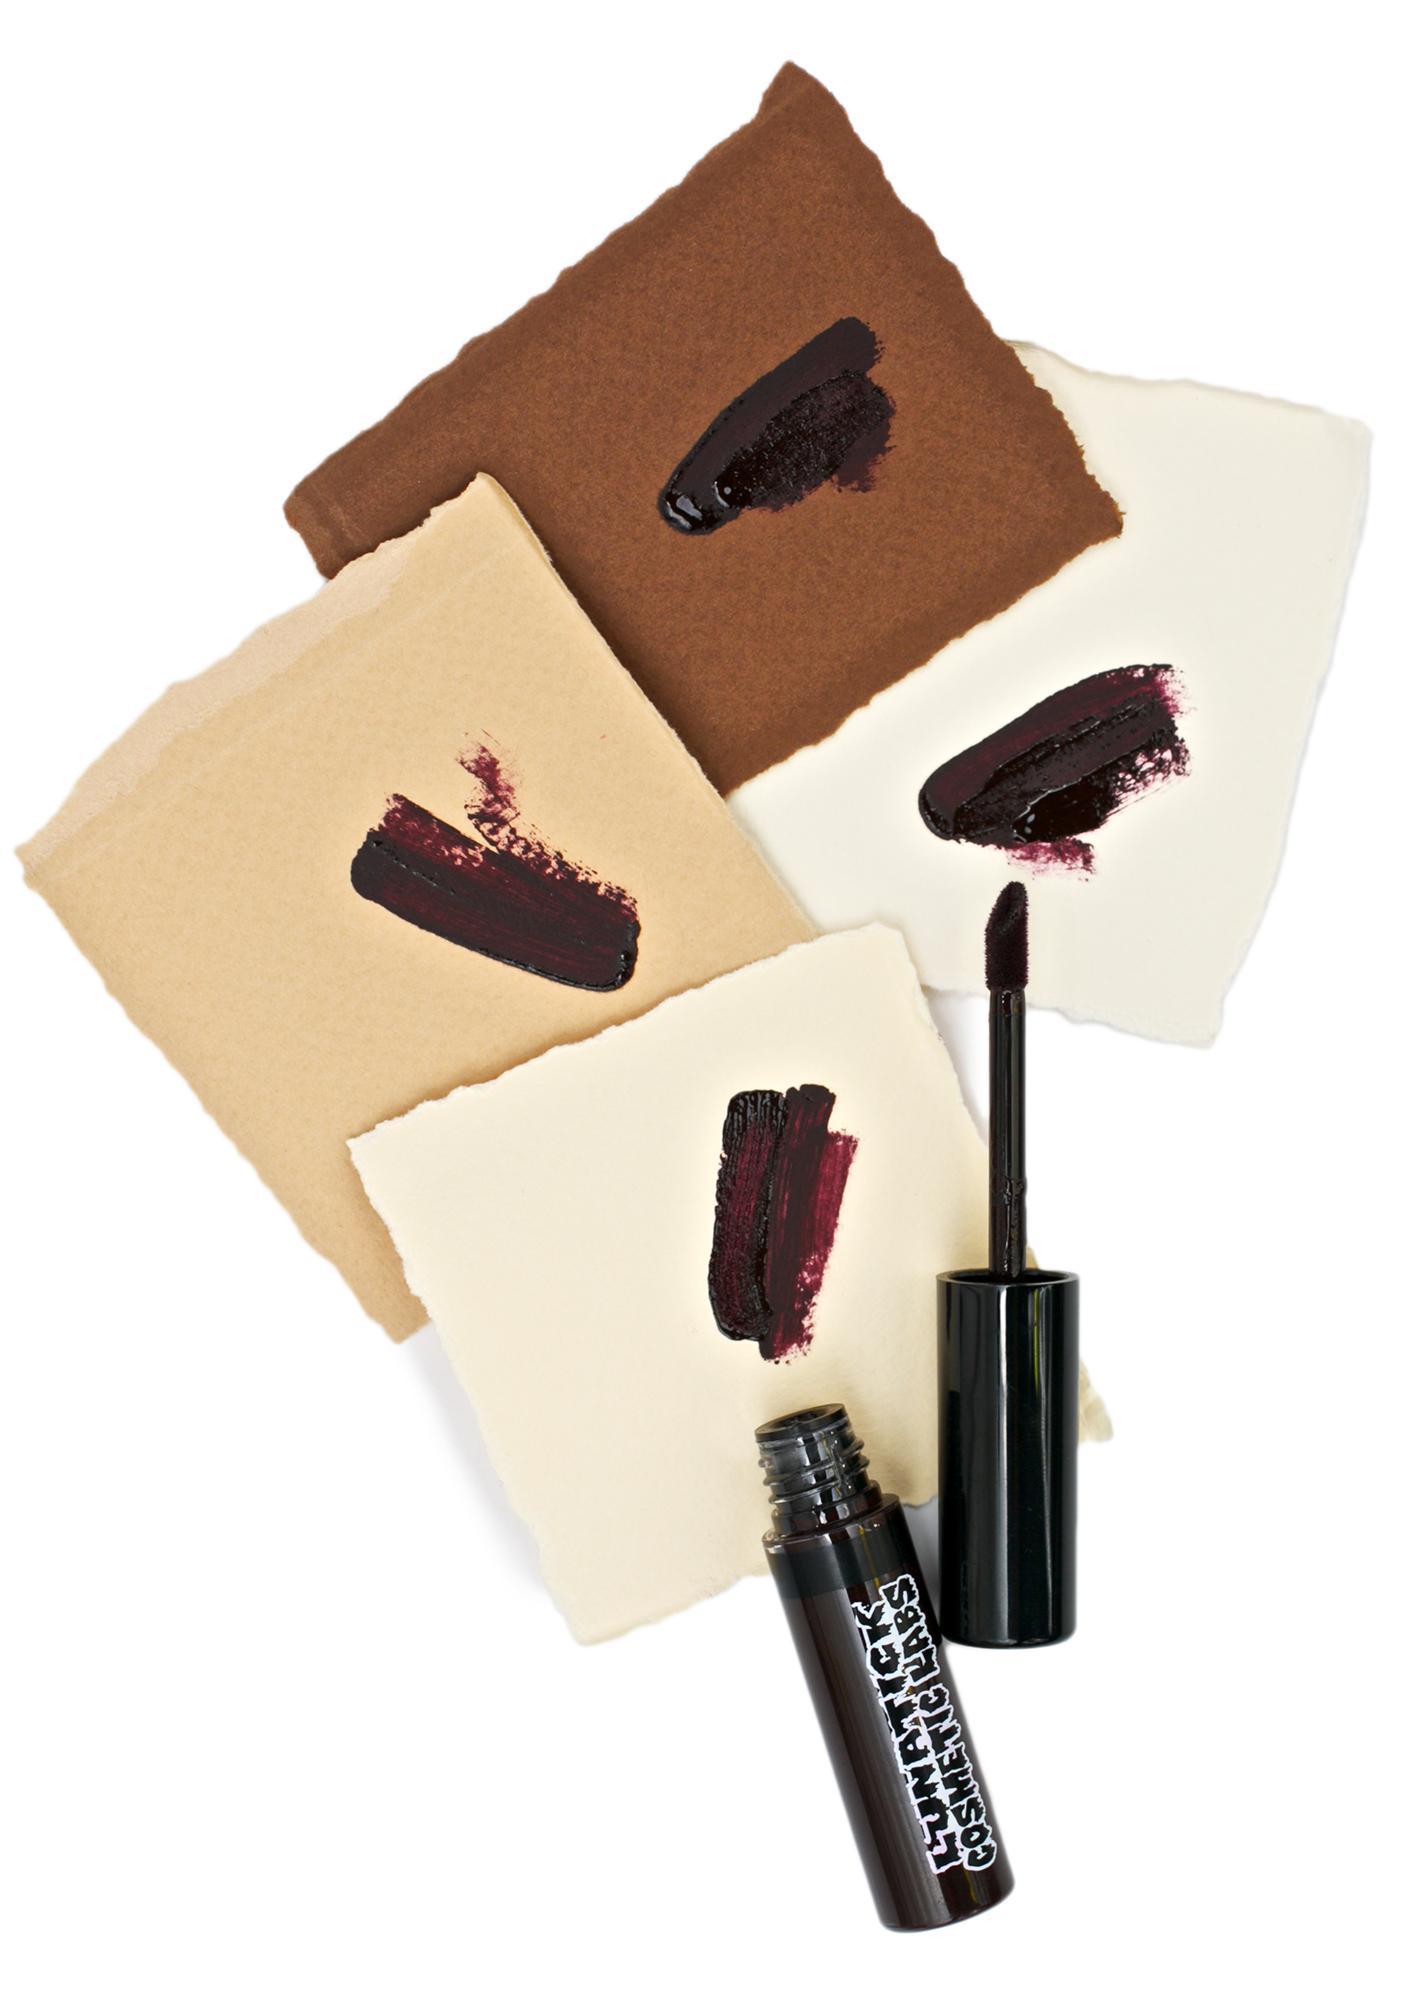 Lunatick Cosmetic Labs Tainted Temptress Lip Slick